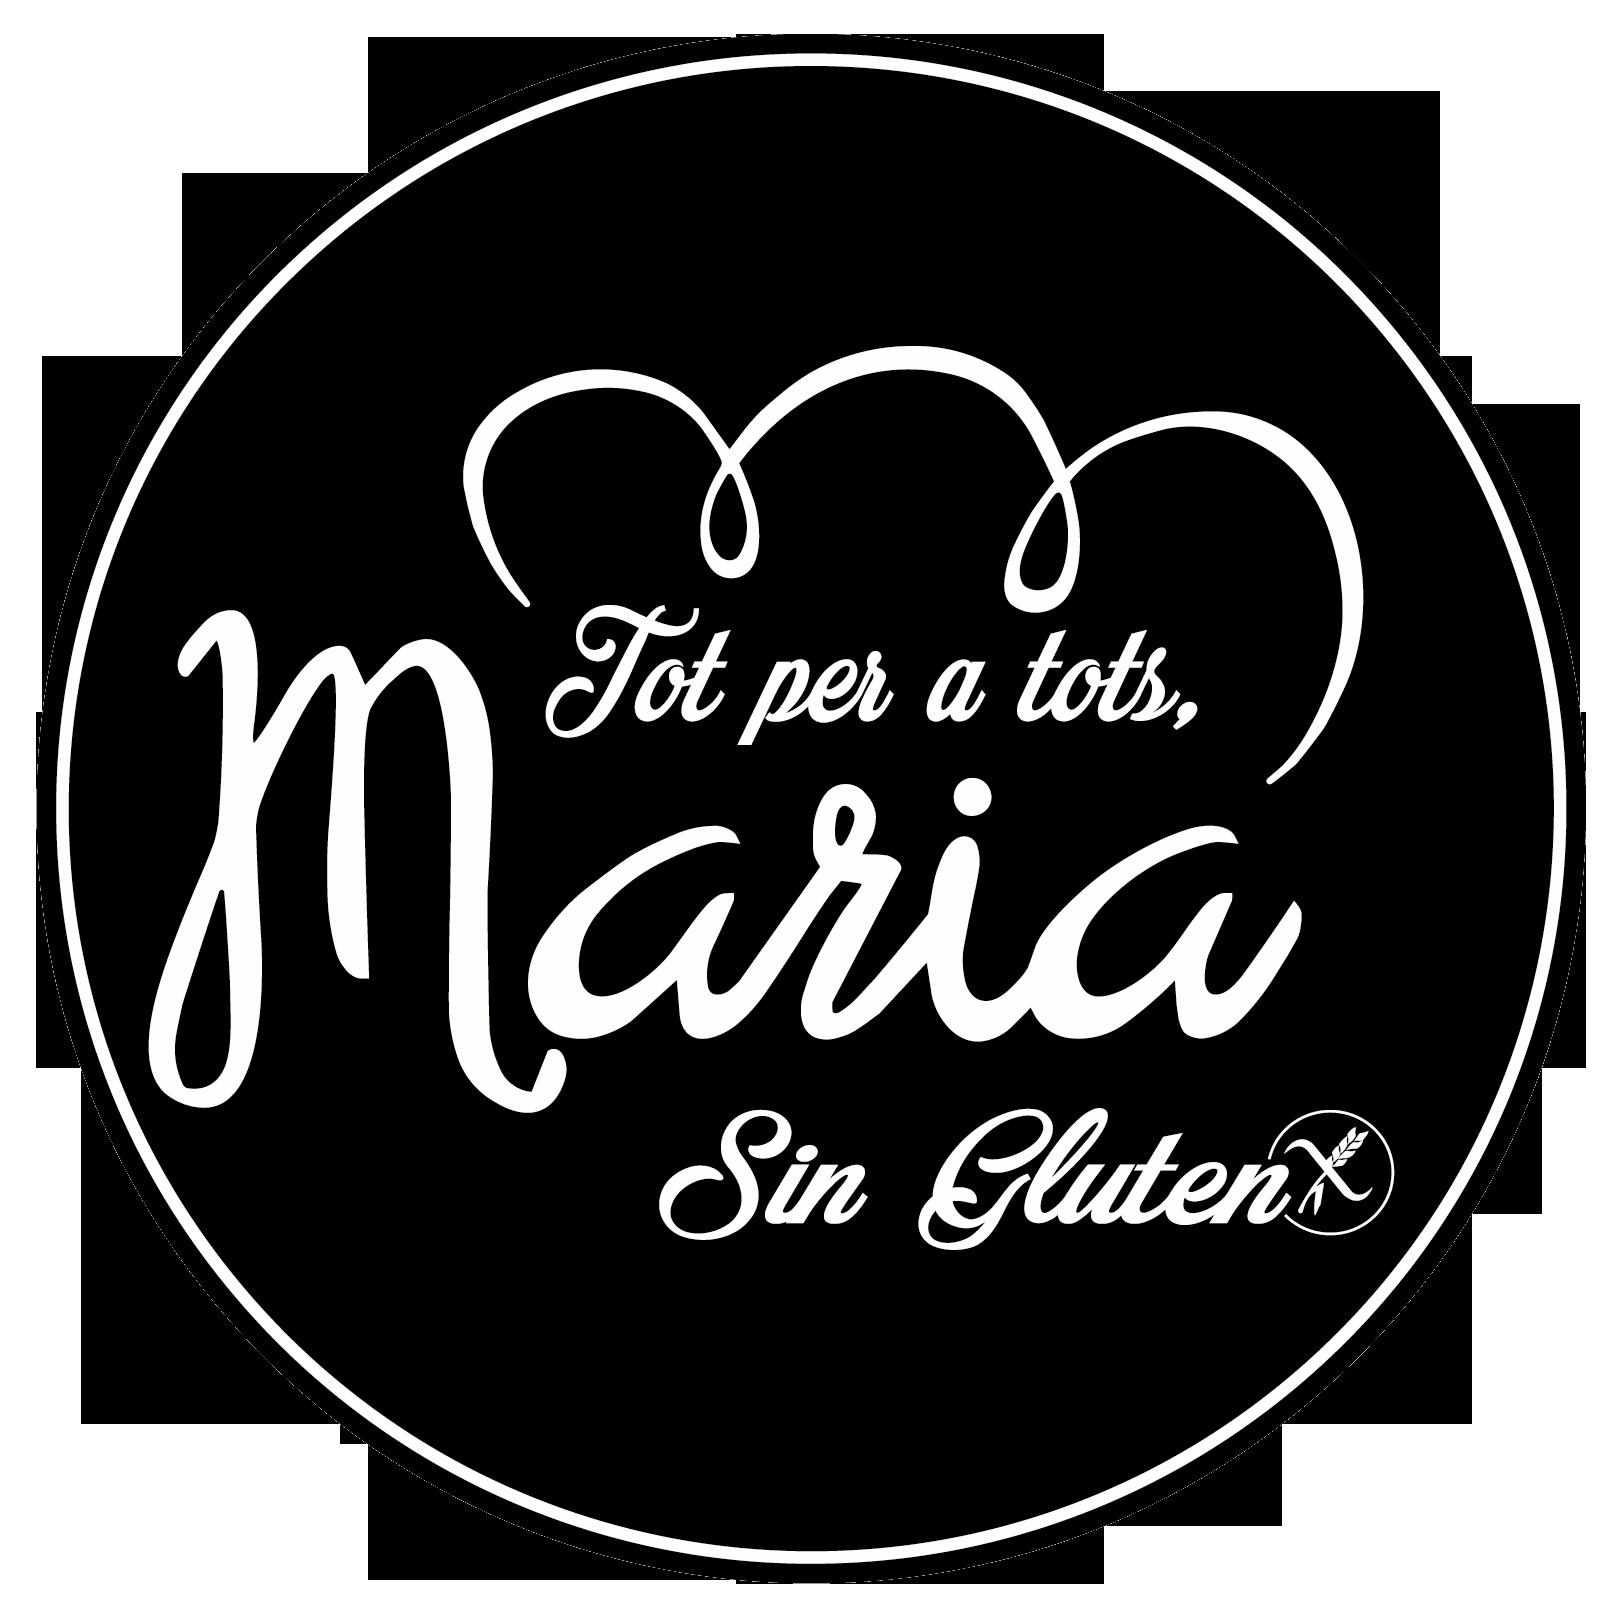 Tot per a tots, Maria. Sin Gluten - Hona panaderia Sin Gluten